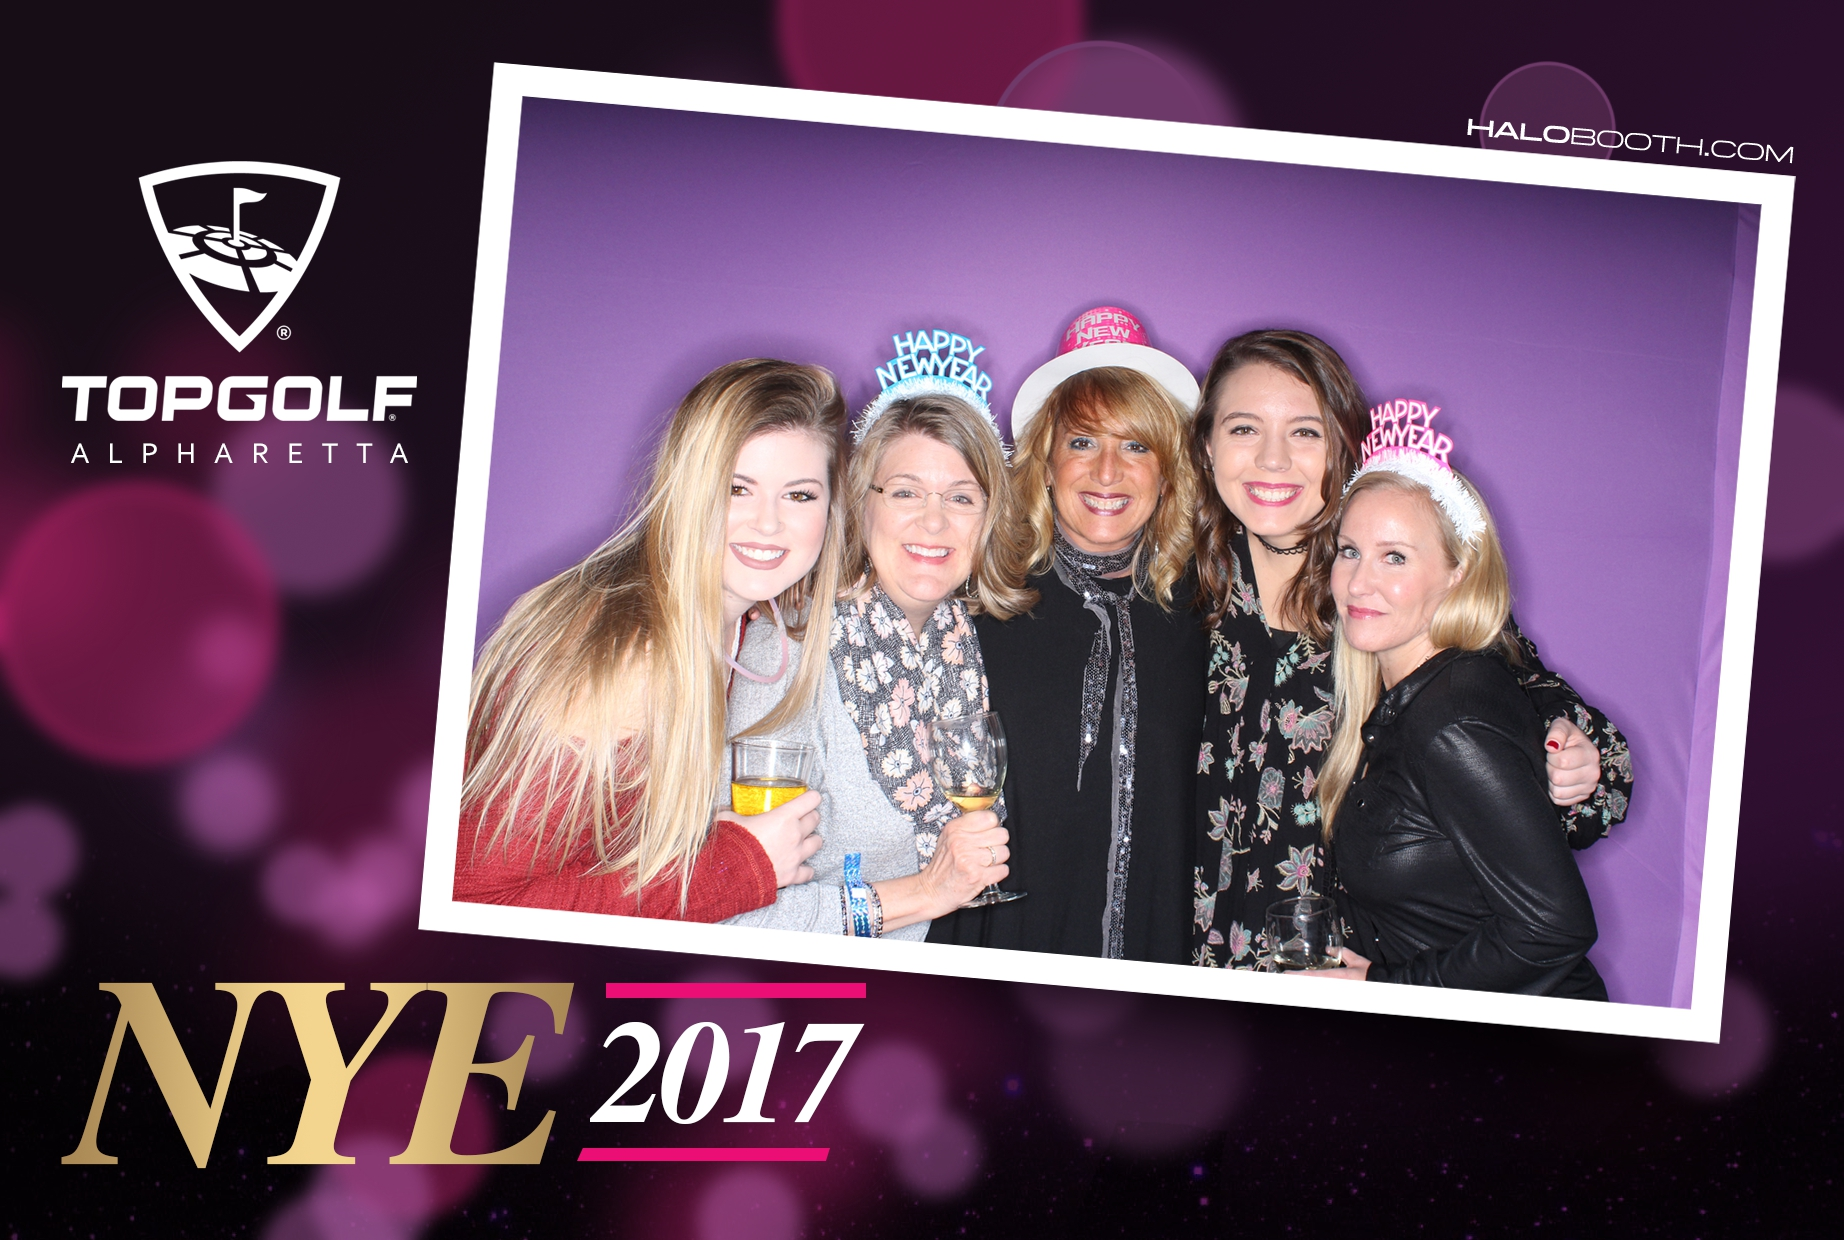 New Year's Eve @ TopGolf Alpharetta